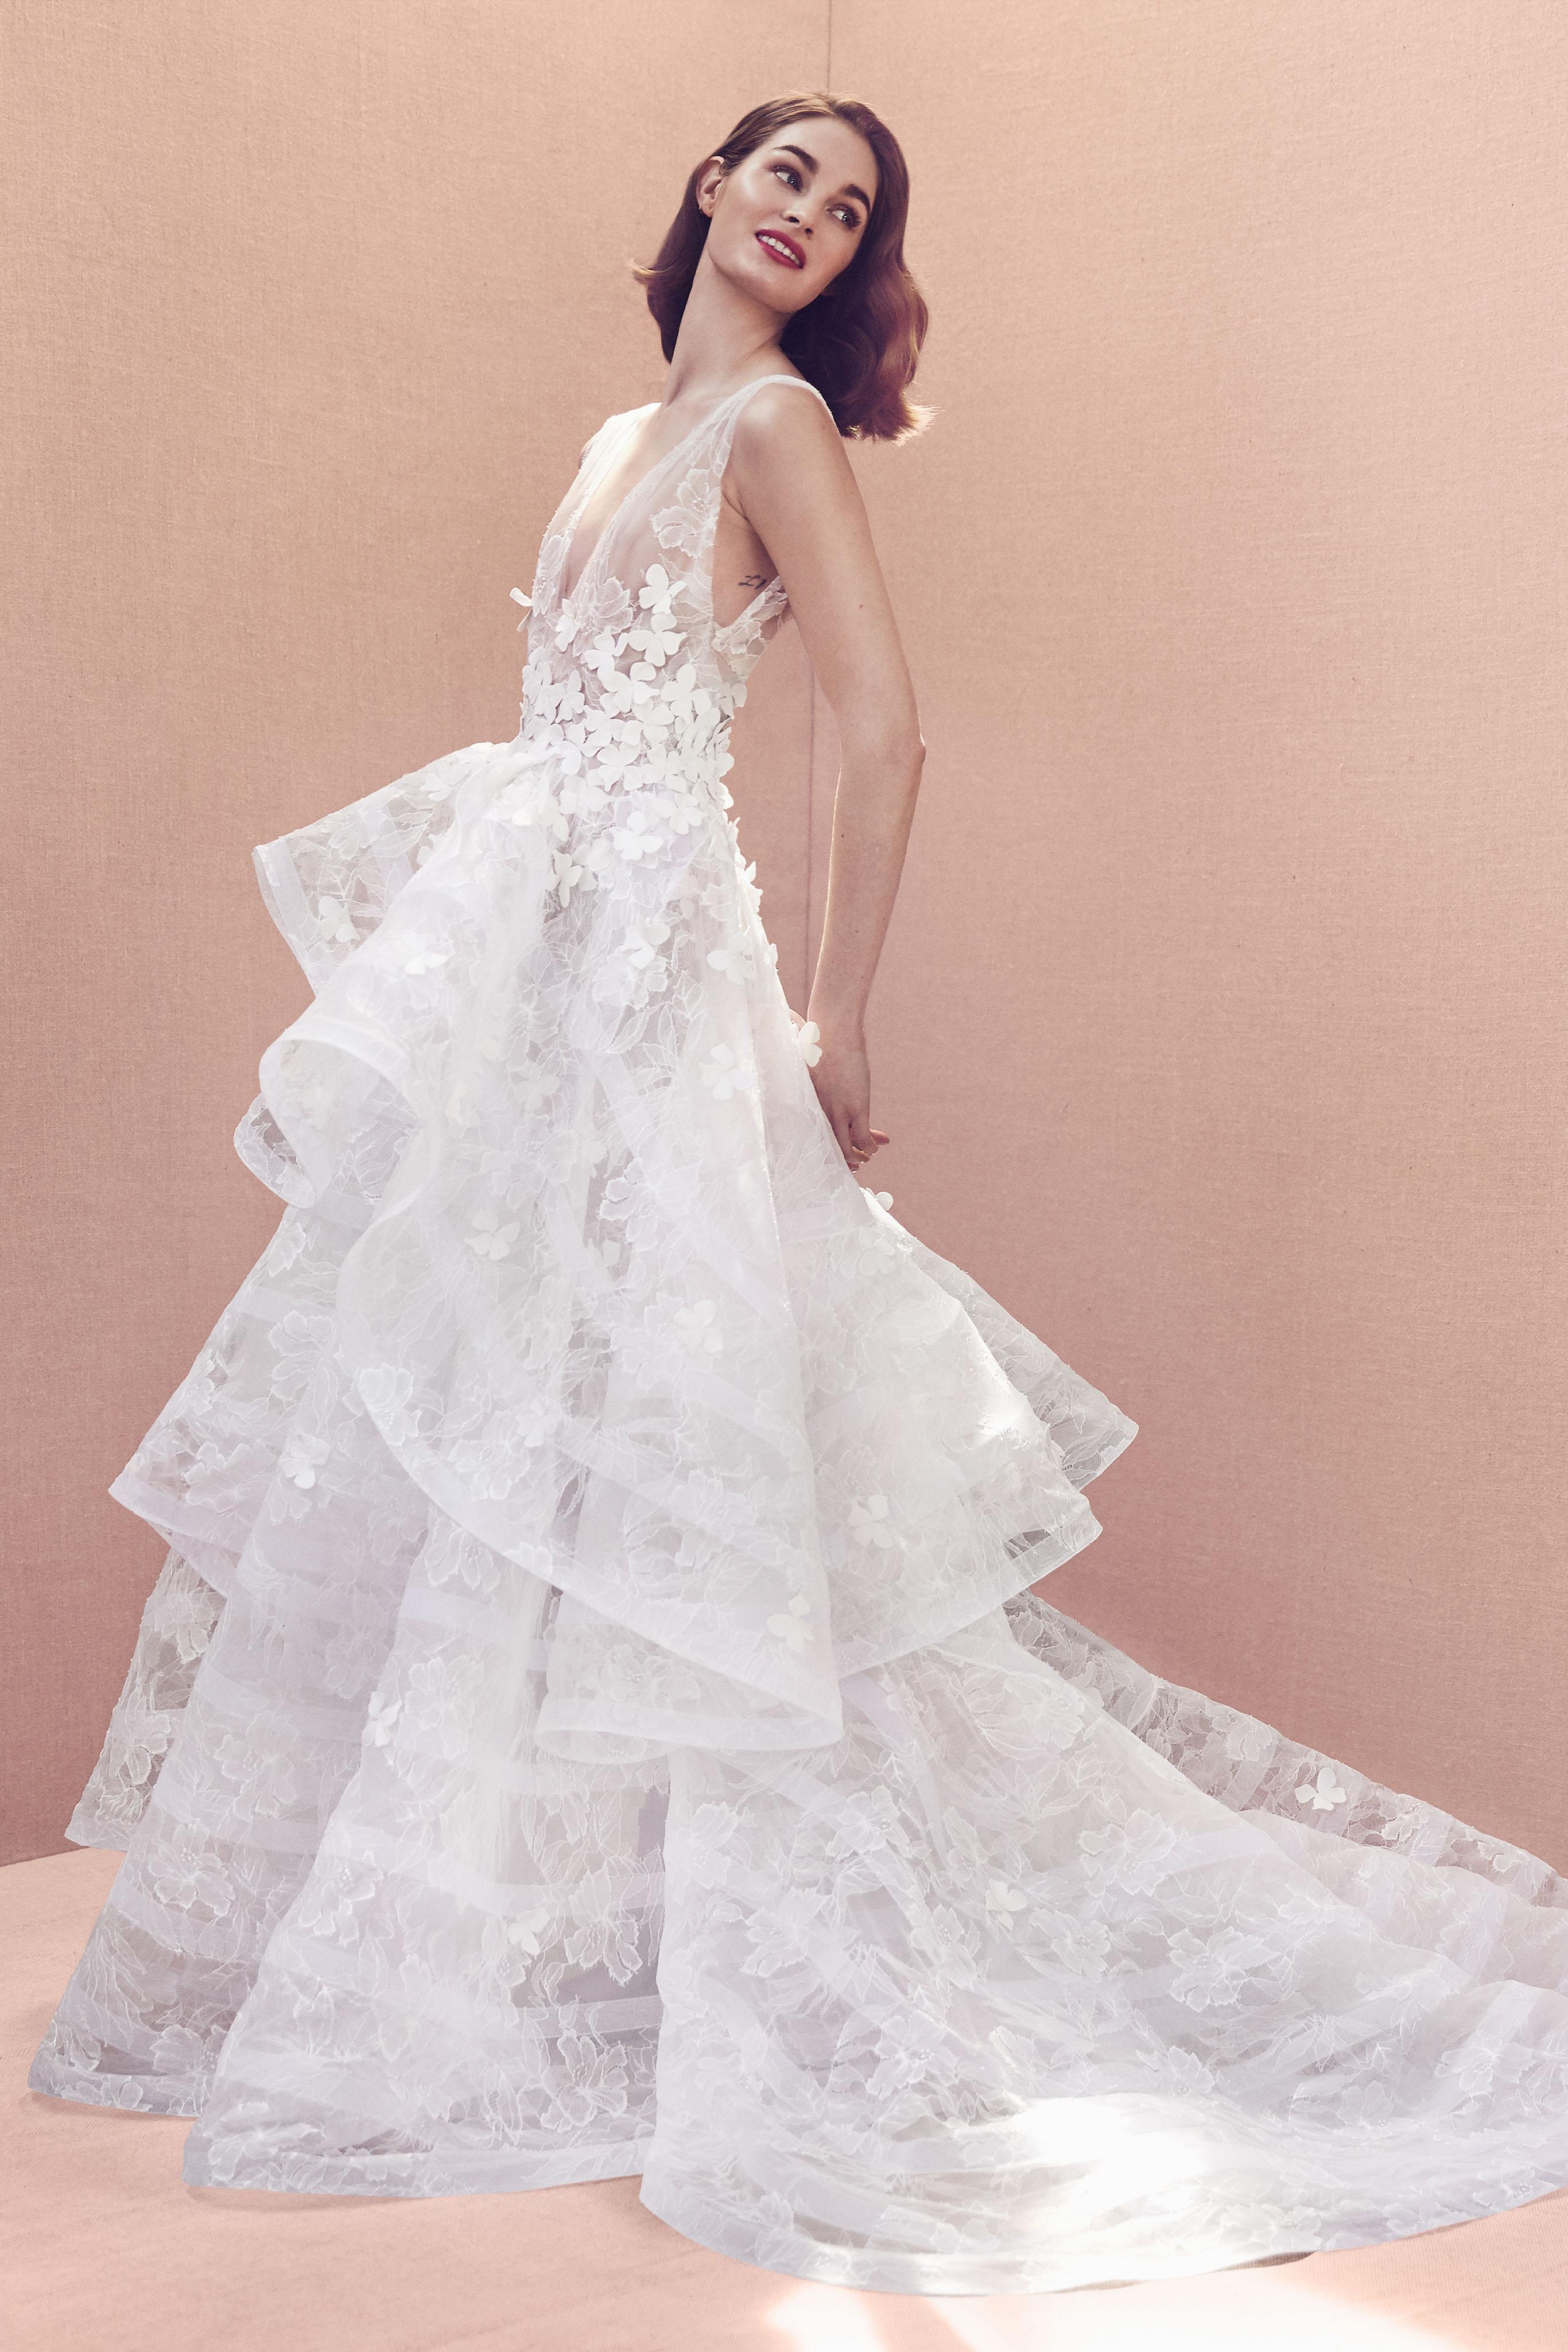 deep v-neck floral applique sleeveless tiered skirt a-line wedding dress Oscar de la Renta Spring 2020